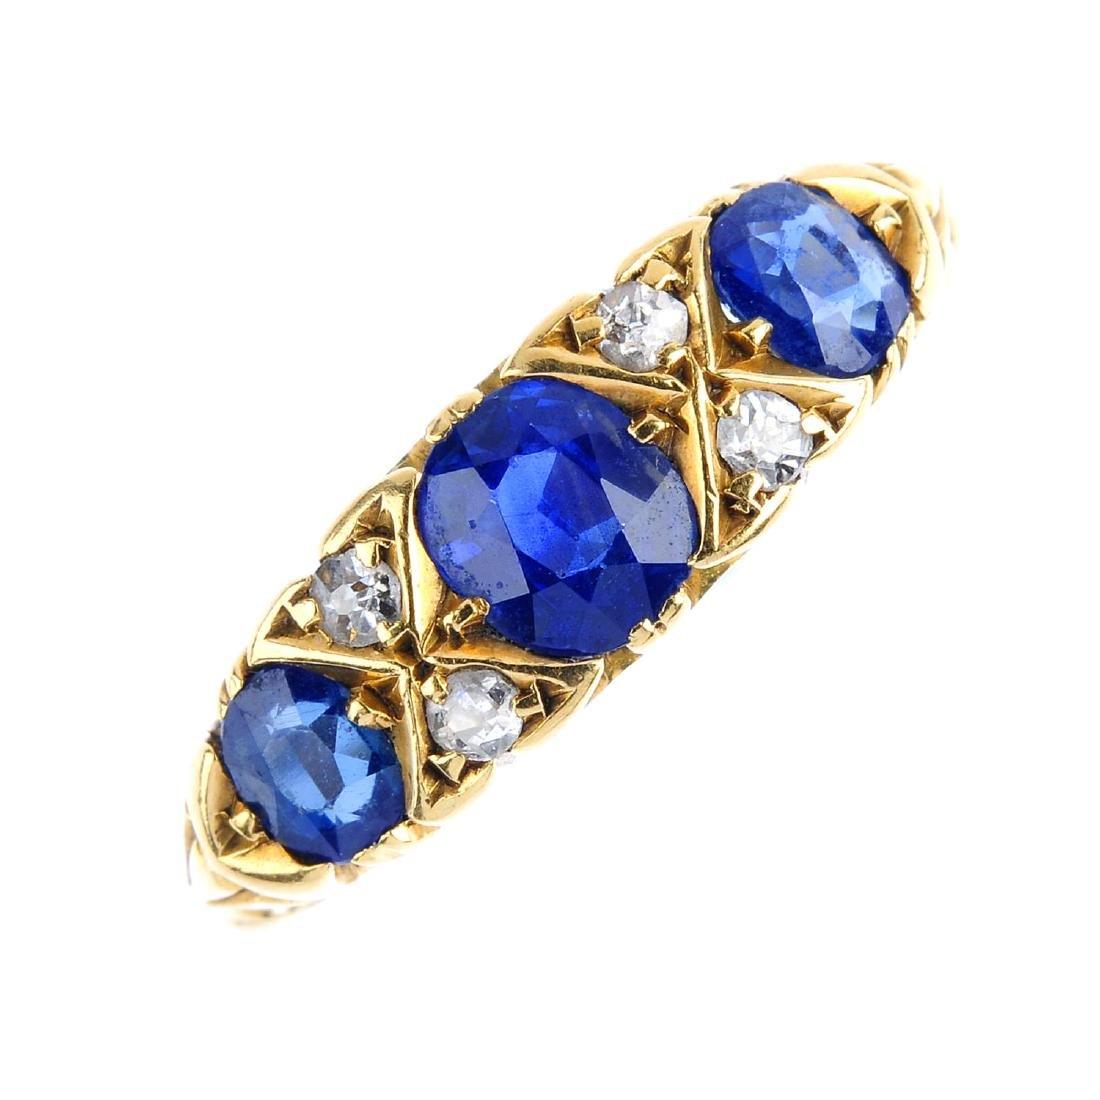 An Edwardian 18ct gold sapphire three-stone and diamond